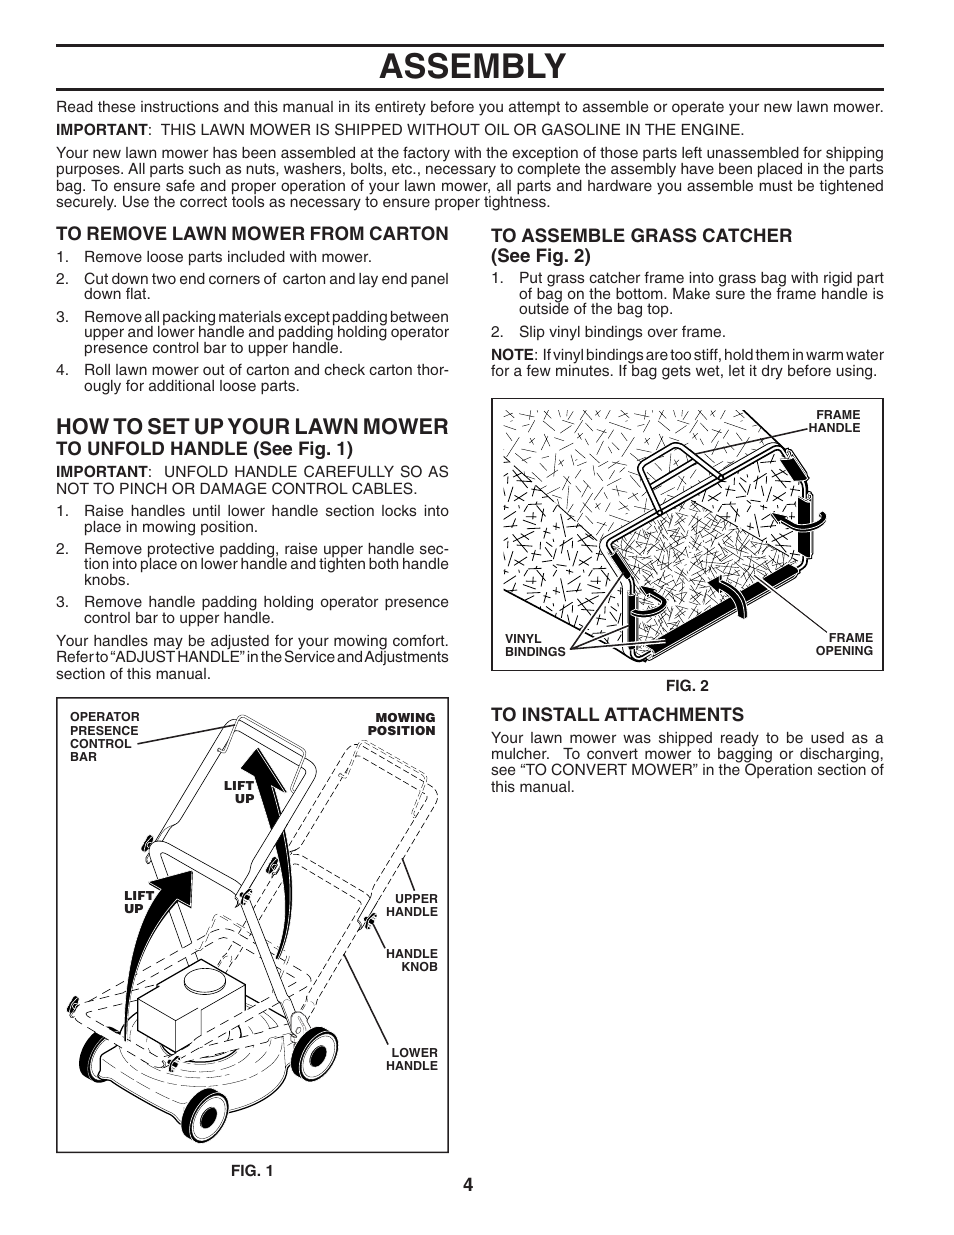 assembly how to set up your lawn mow er husqvarna 7021p user rh manualsdir com husqvarna mower 7021p manual husqvarna 7021p parts manual